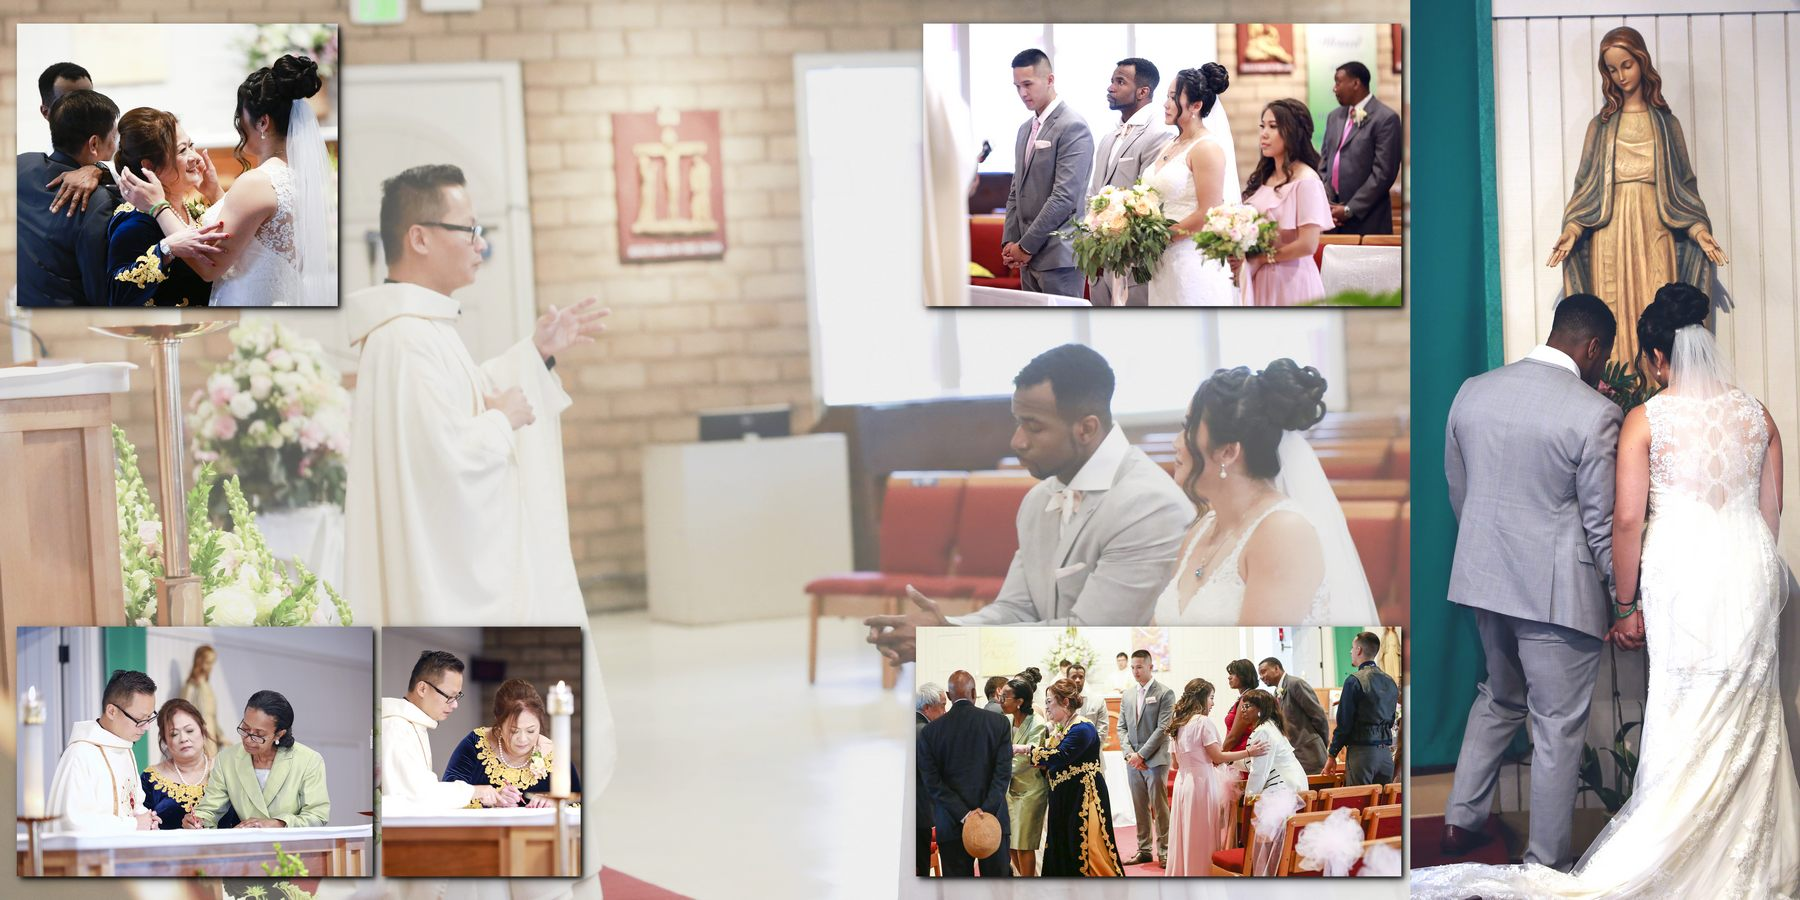 Keneisha wedding album 007 (Sides 12-13)